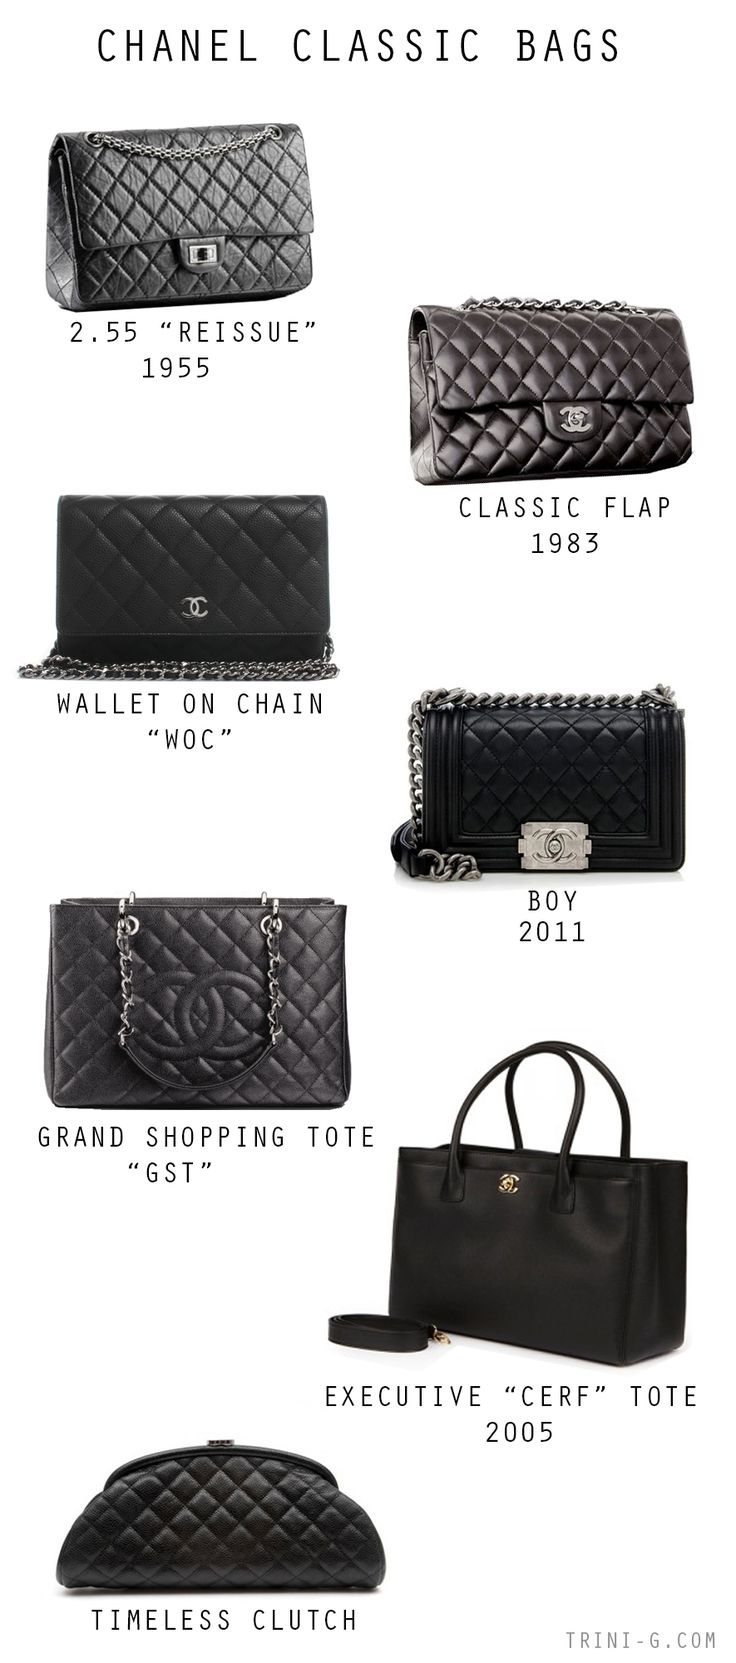 Perfect supursestyle bag choice - www.supursestyle.com Trini blog | Chanel classic bags